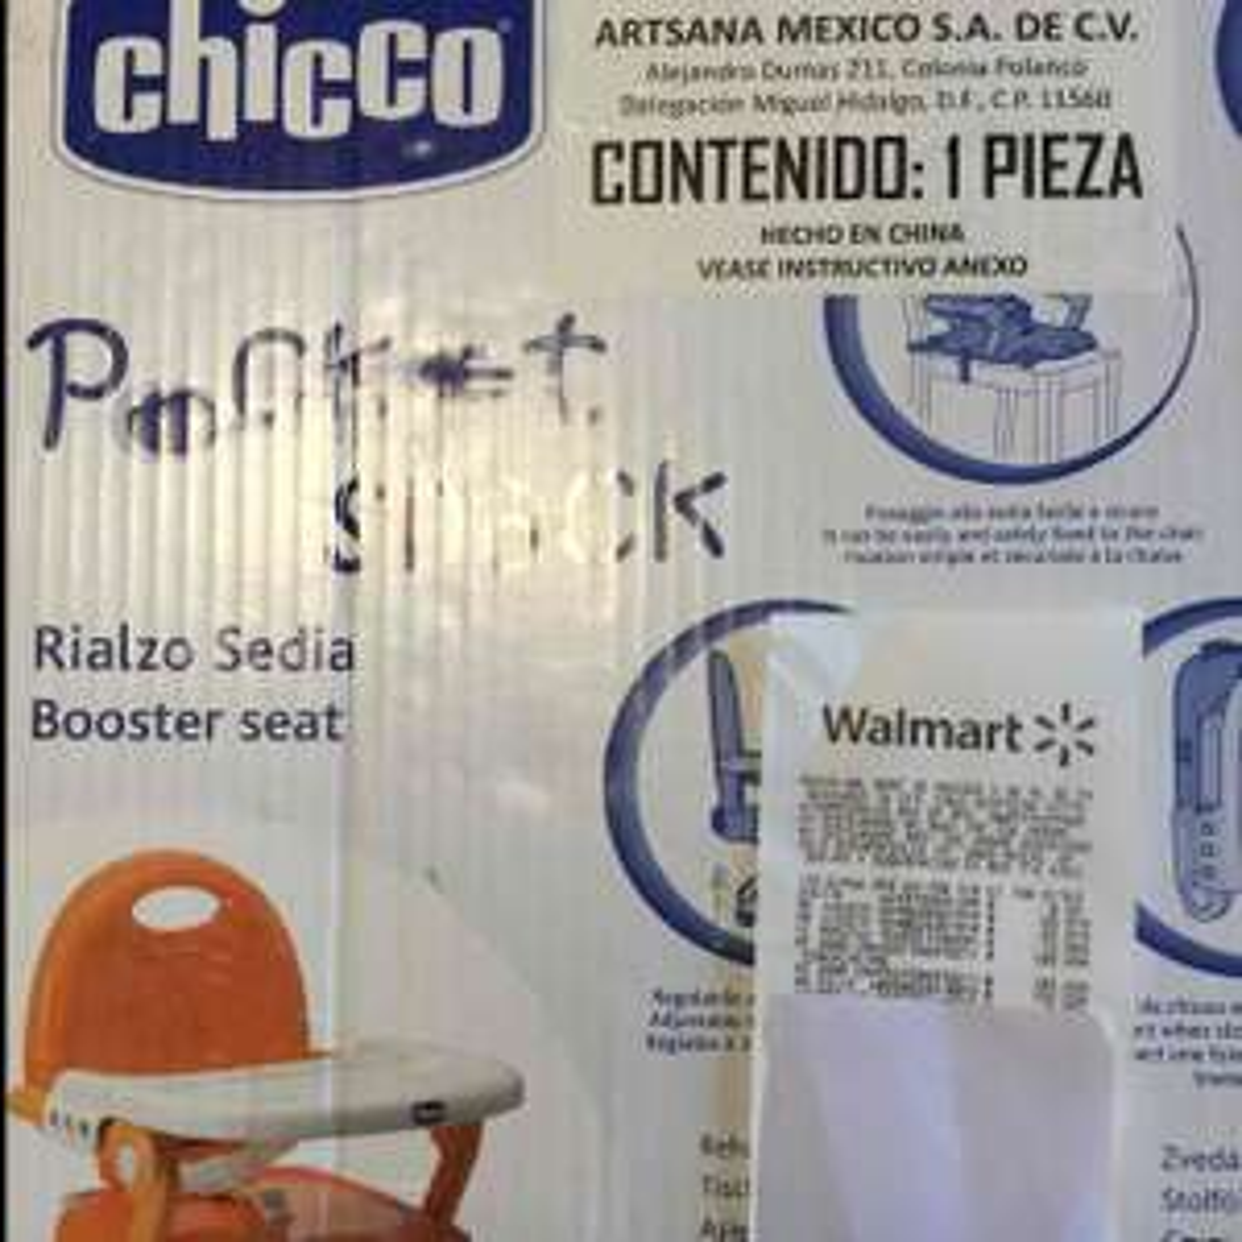 Walmart Cuitlahuac: Chicco poket snack (periquera plegable) a $150.02